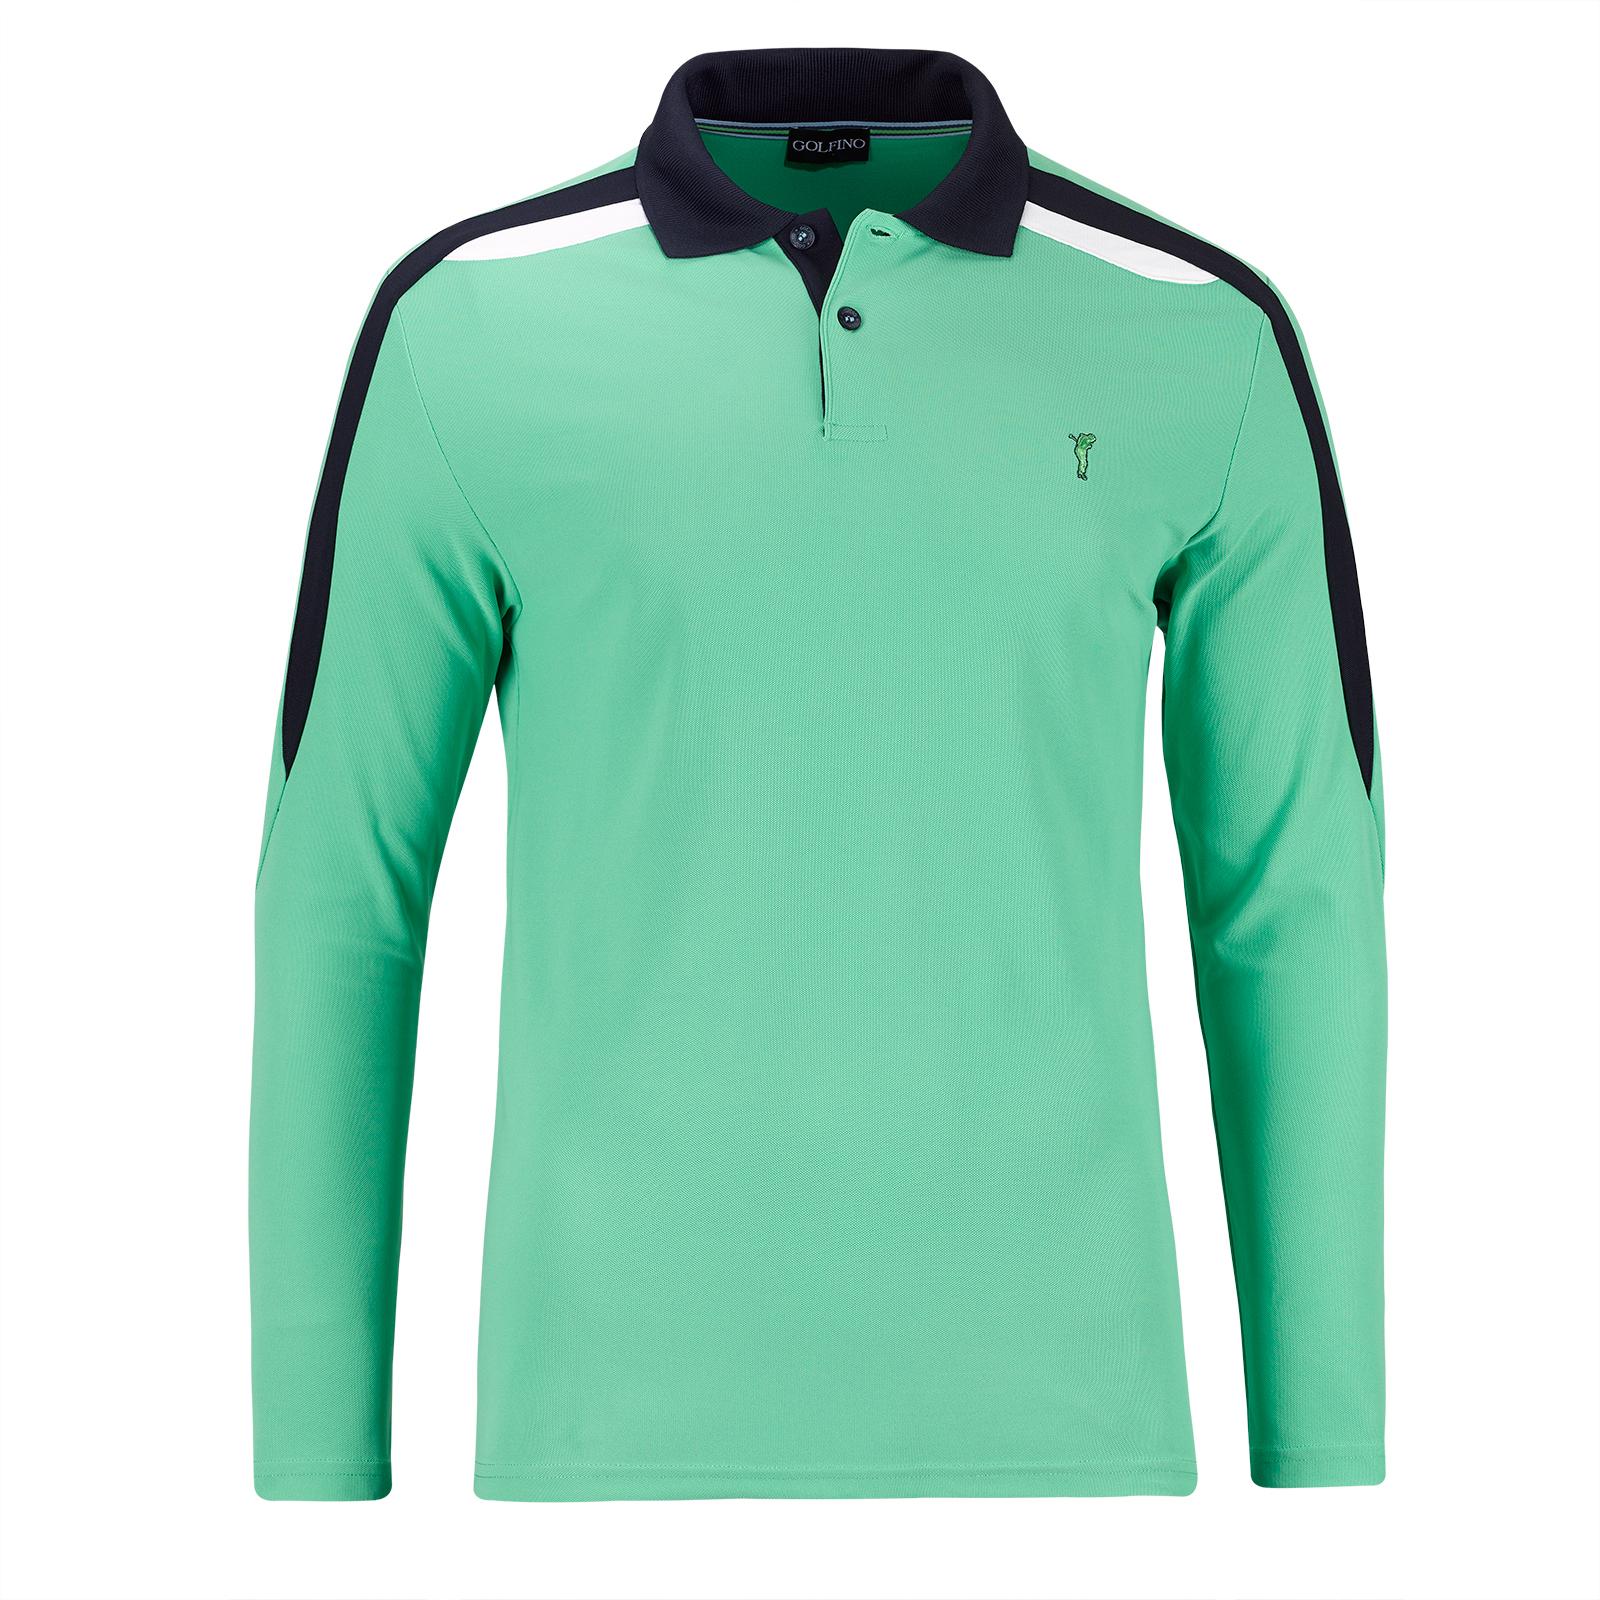 Herren Langarm Performance Golfpolo mit Quick Dry Funktion